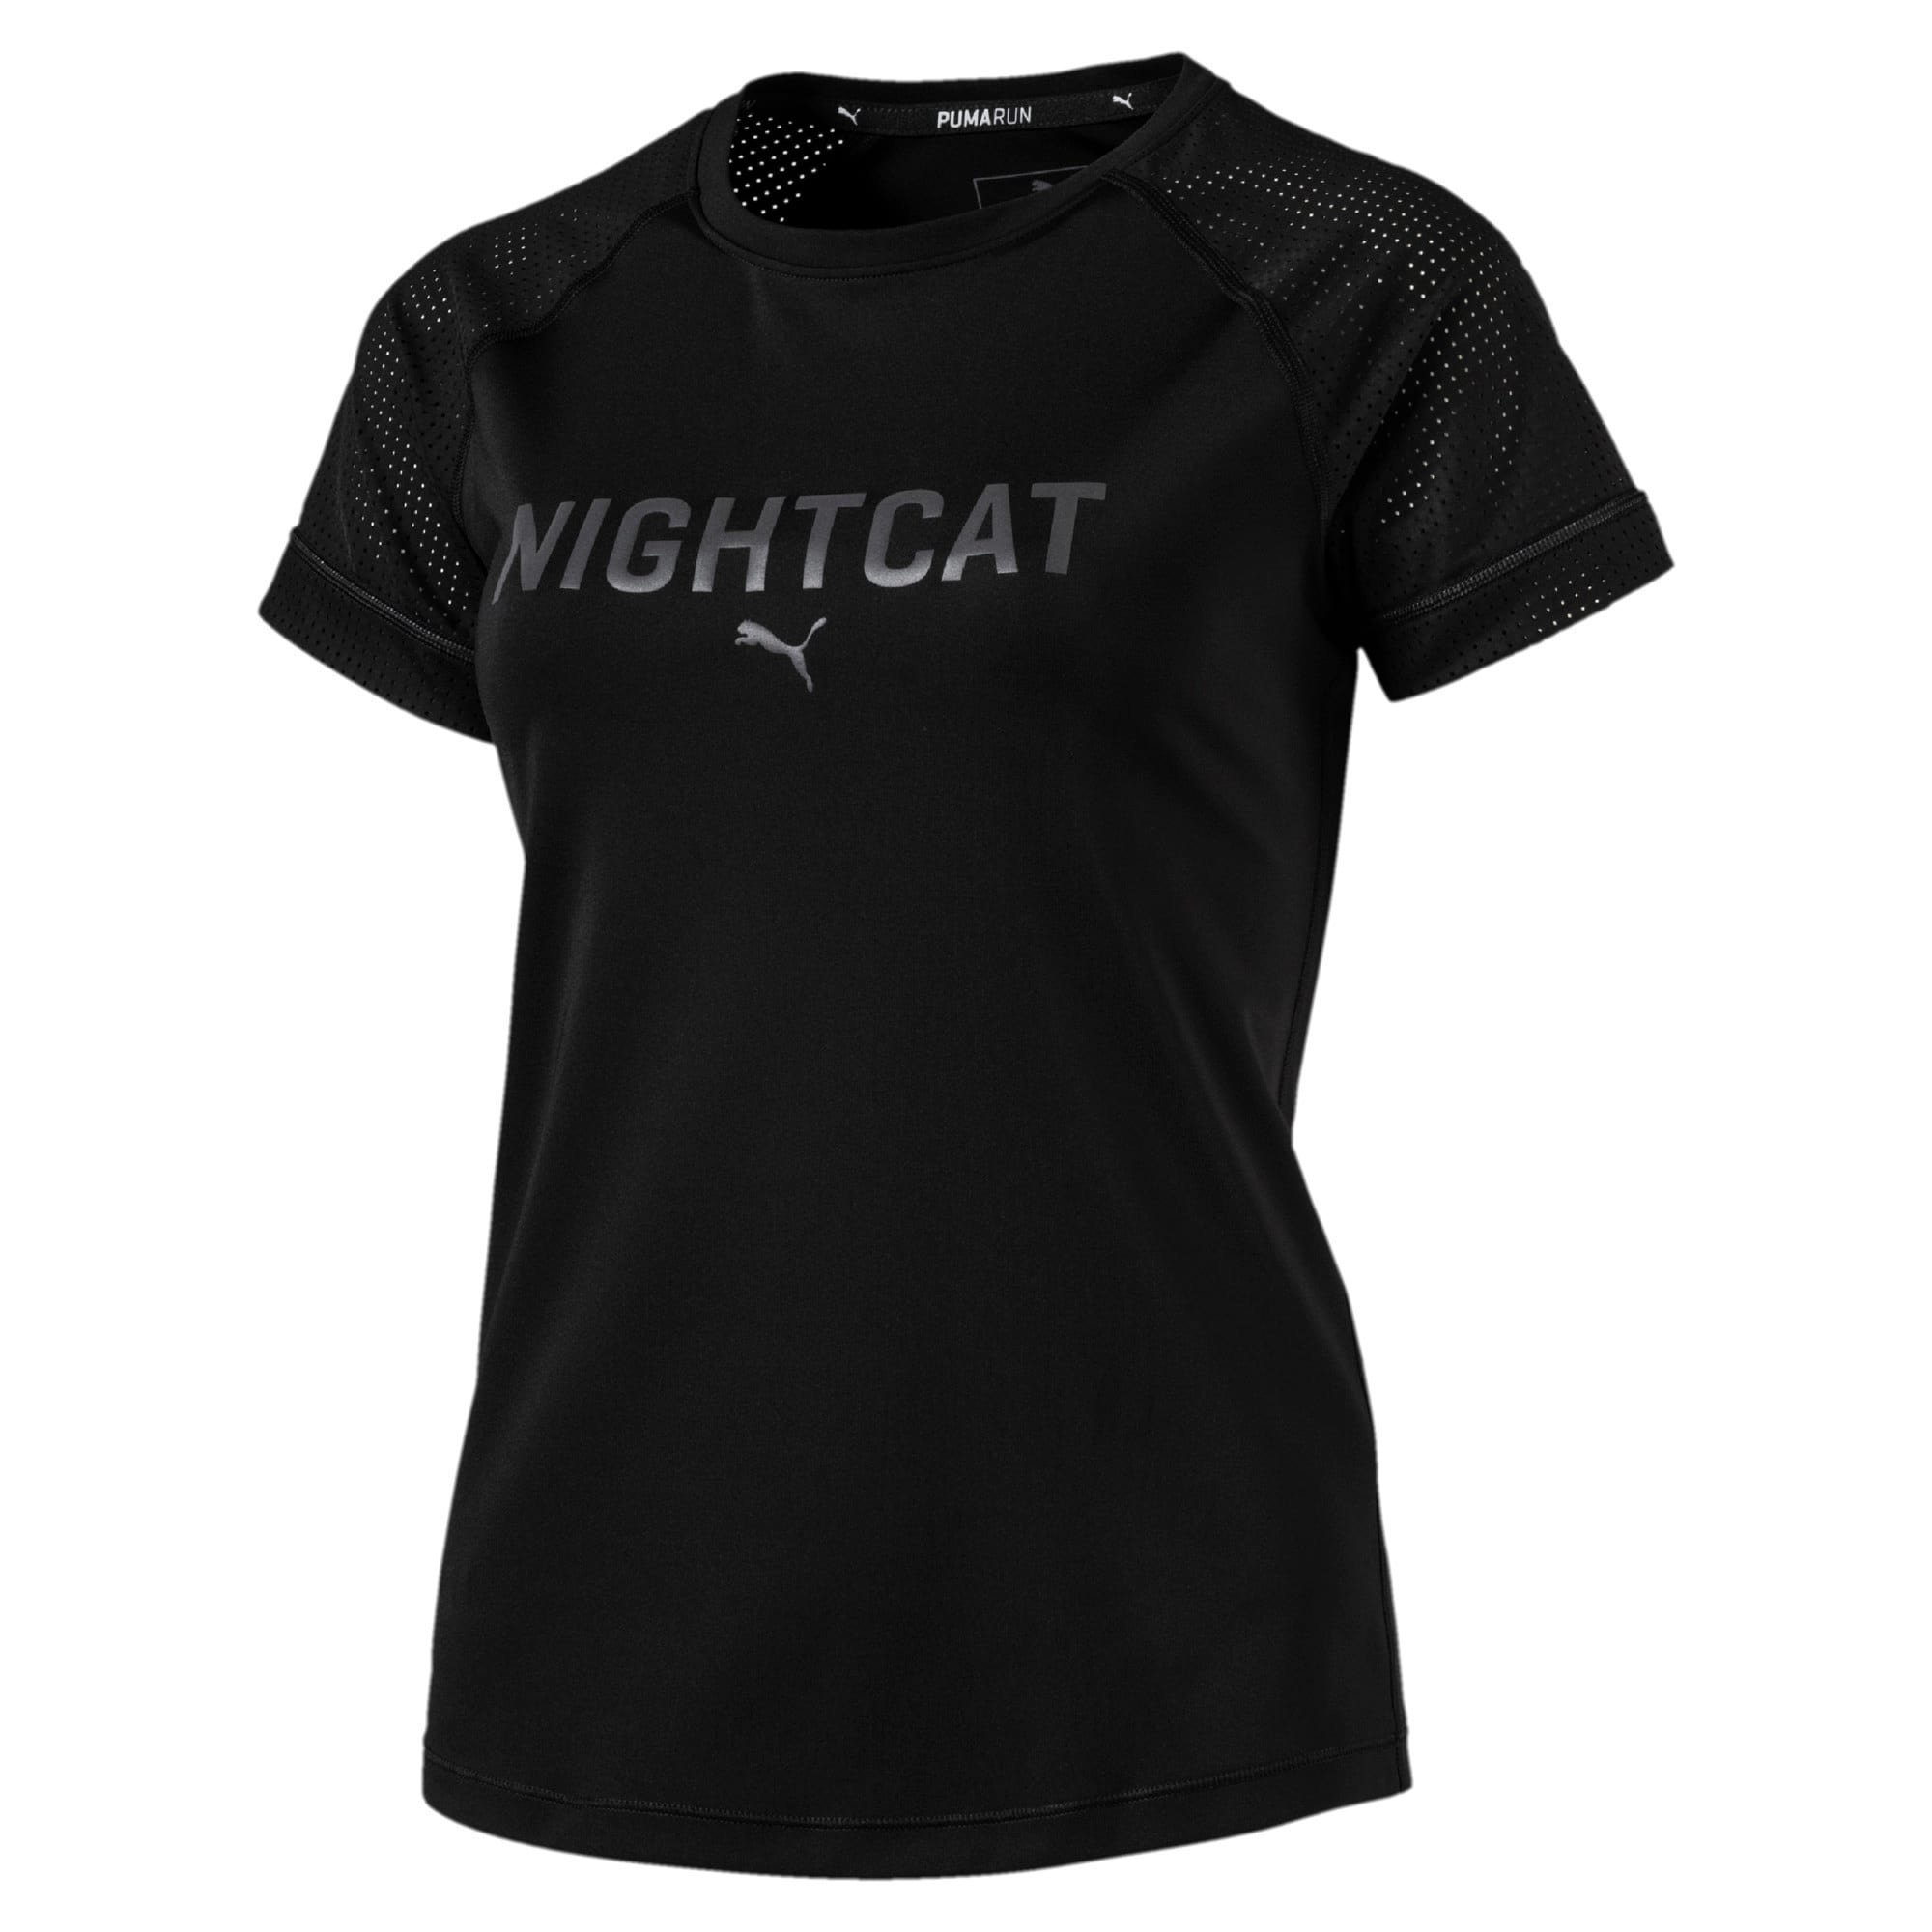 Thumbnail 6 of NightCat Women's Short Sleeve T-Shirt, Puma Black, medium-IND